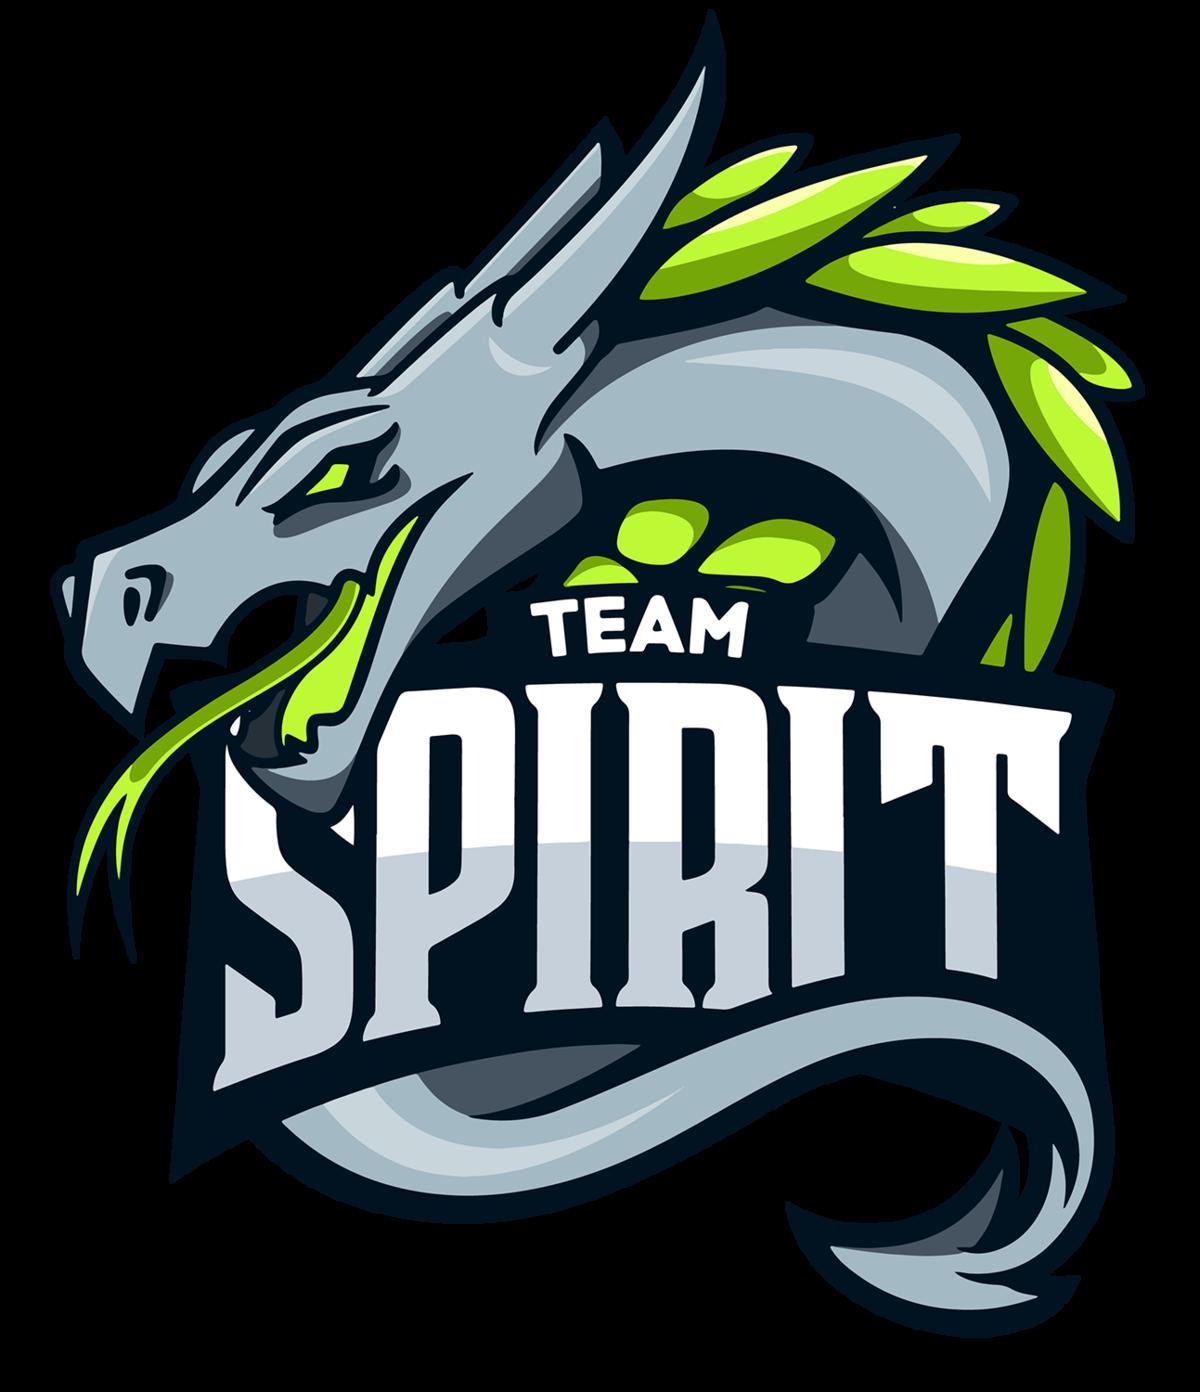 Logo Onic Esport Png